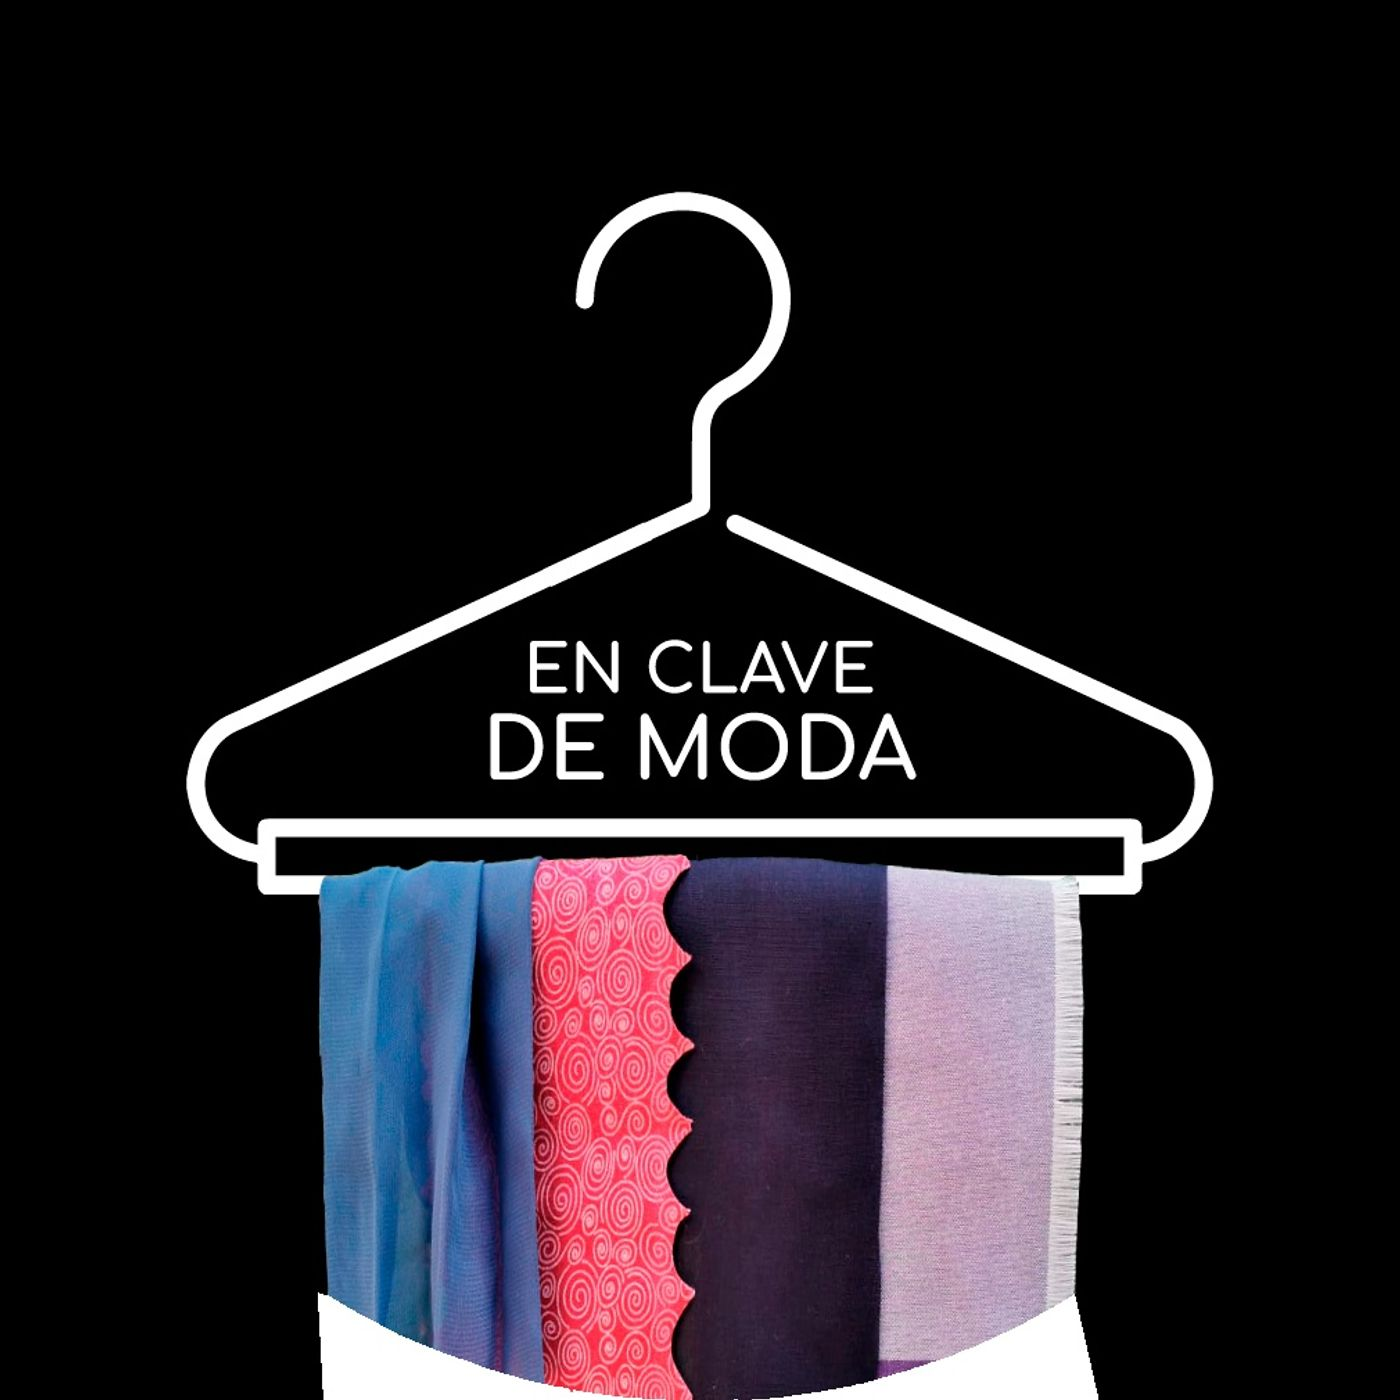 EN CLAVE DE MODA